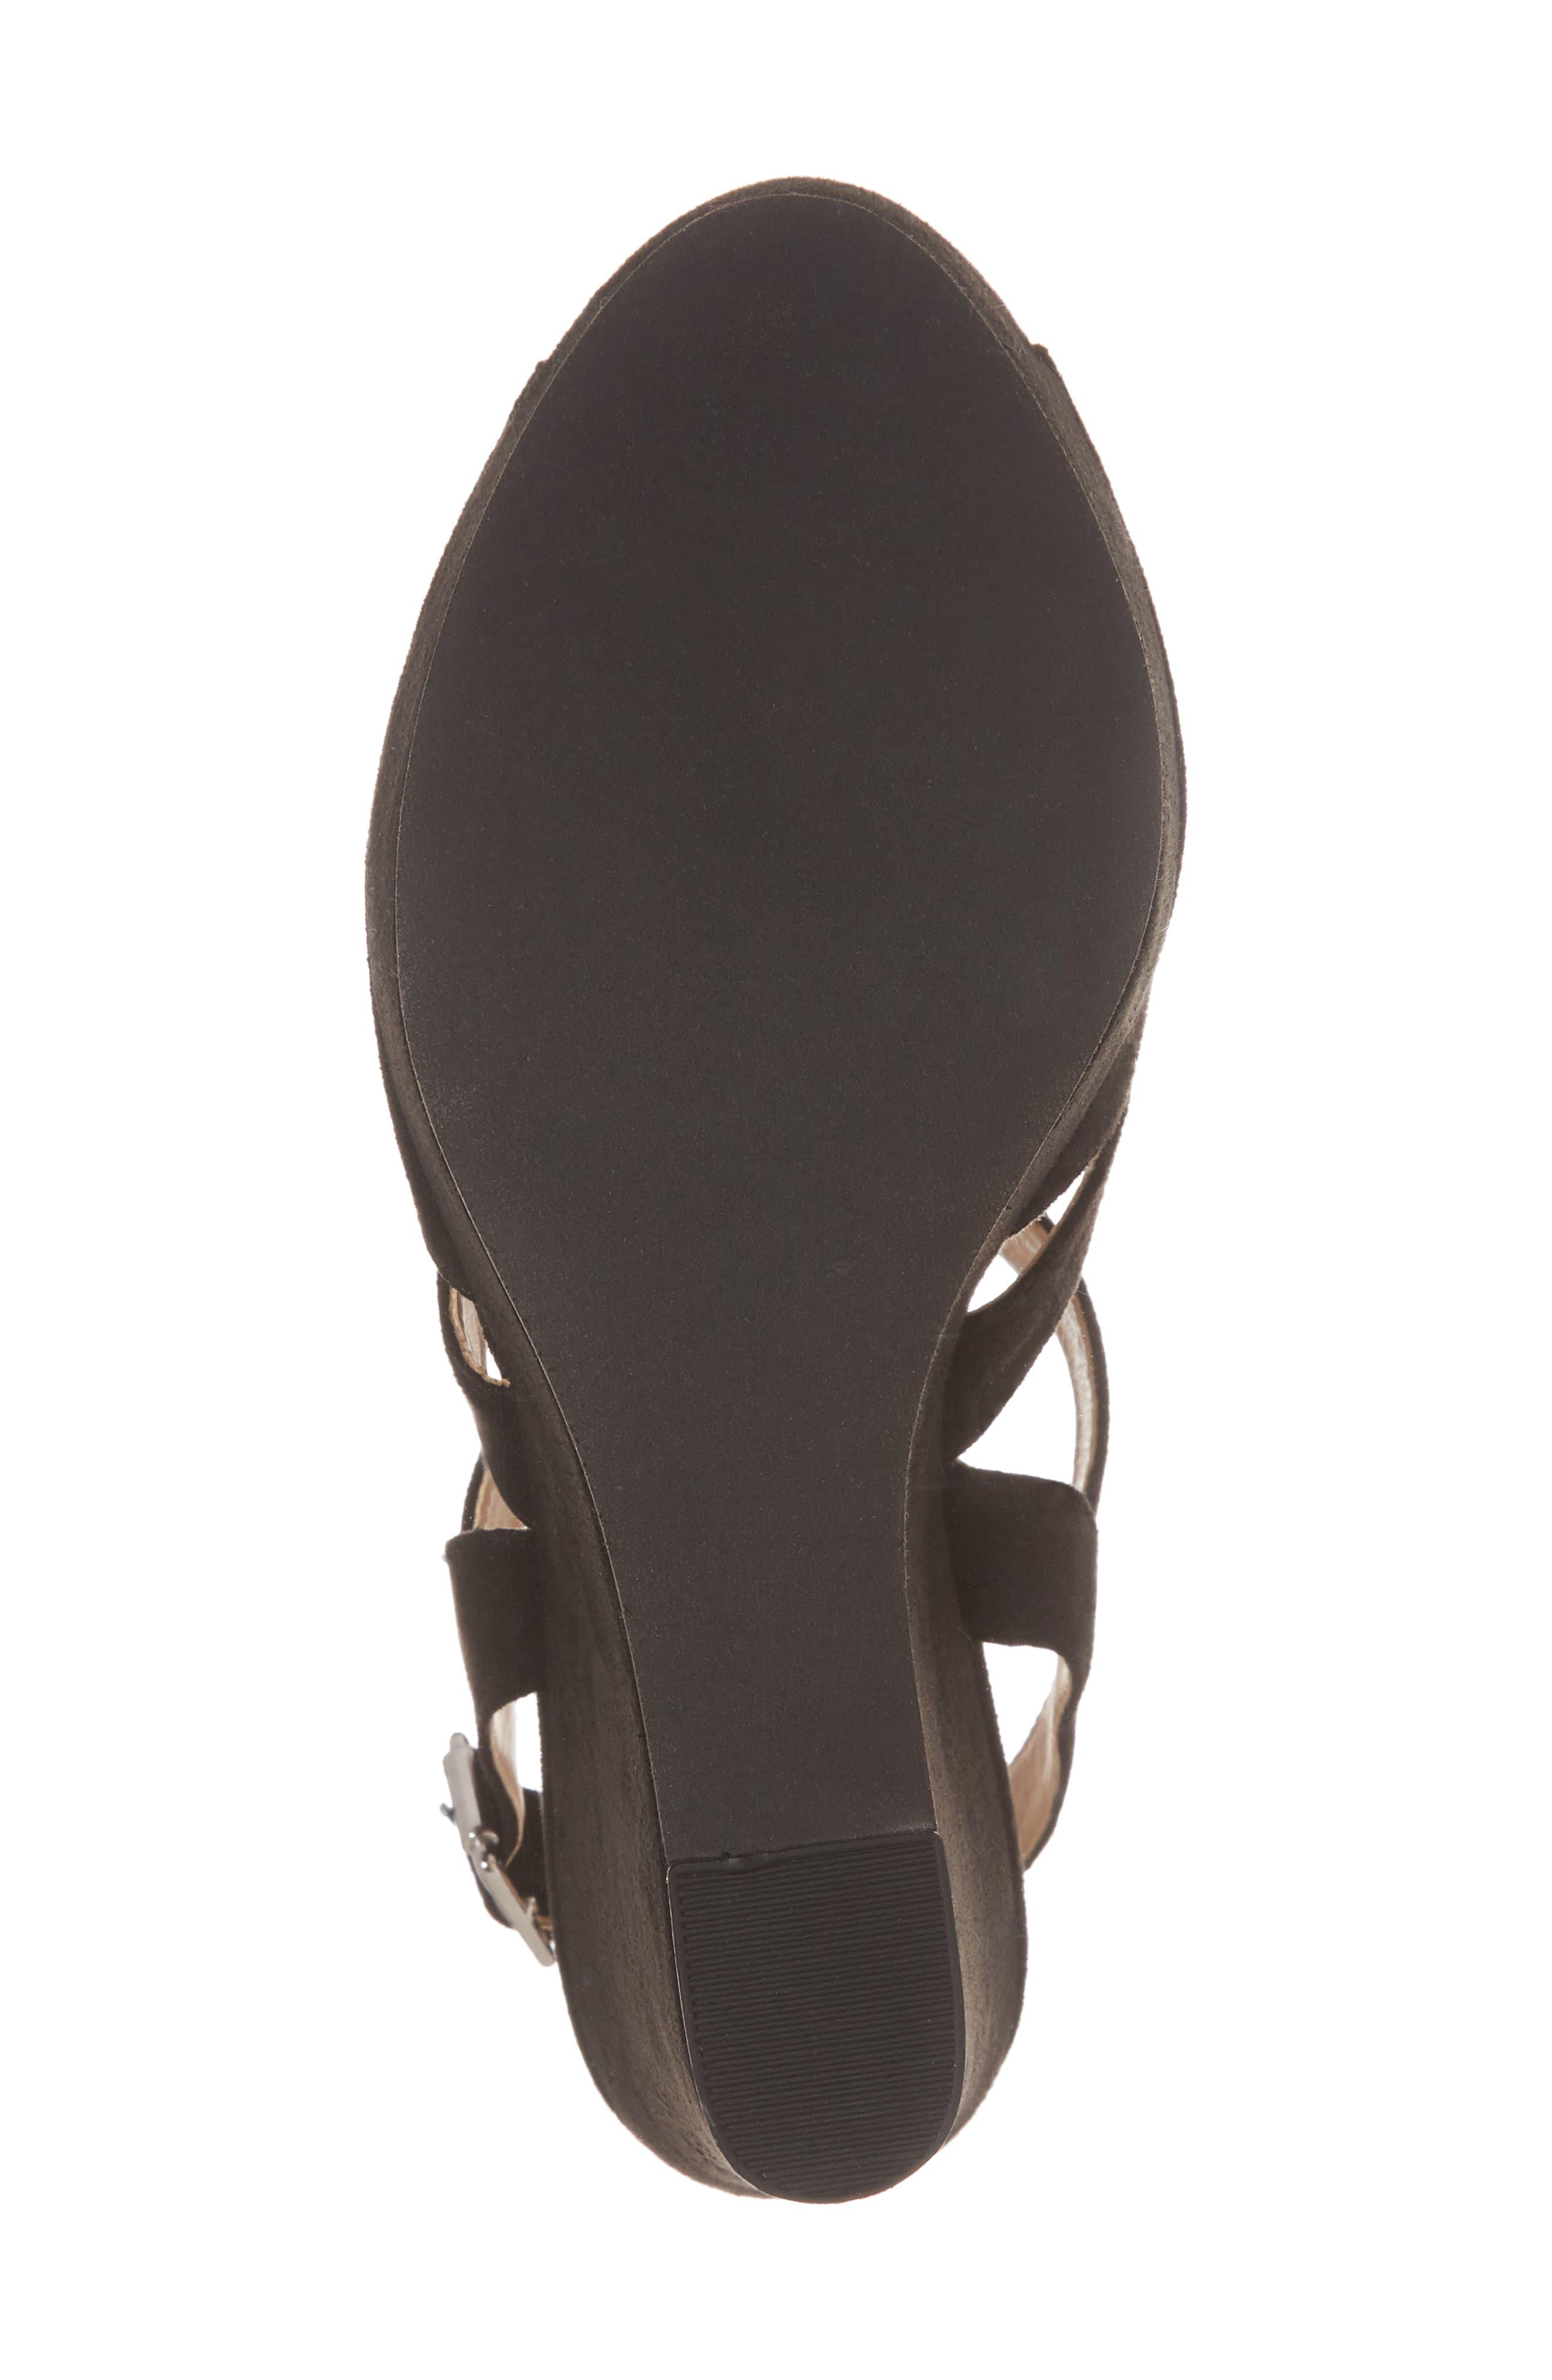 Sunny Platform Wedge Sandal,                             Alternate thumbnail 31, color,